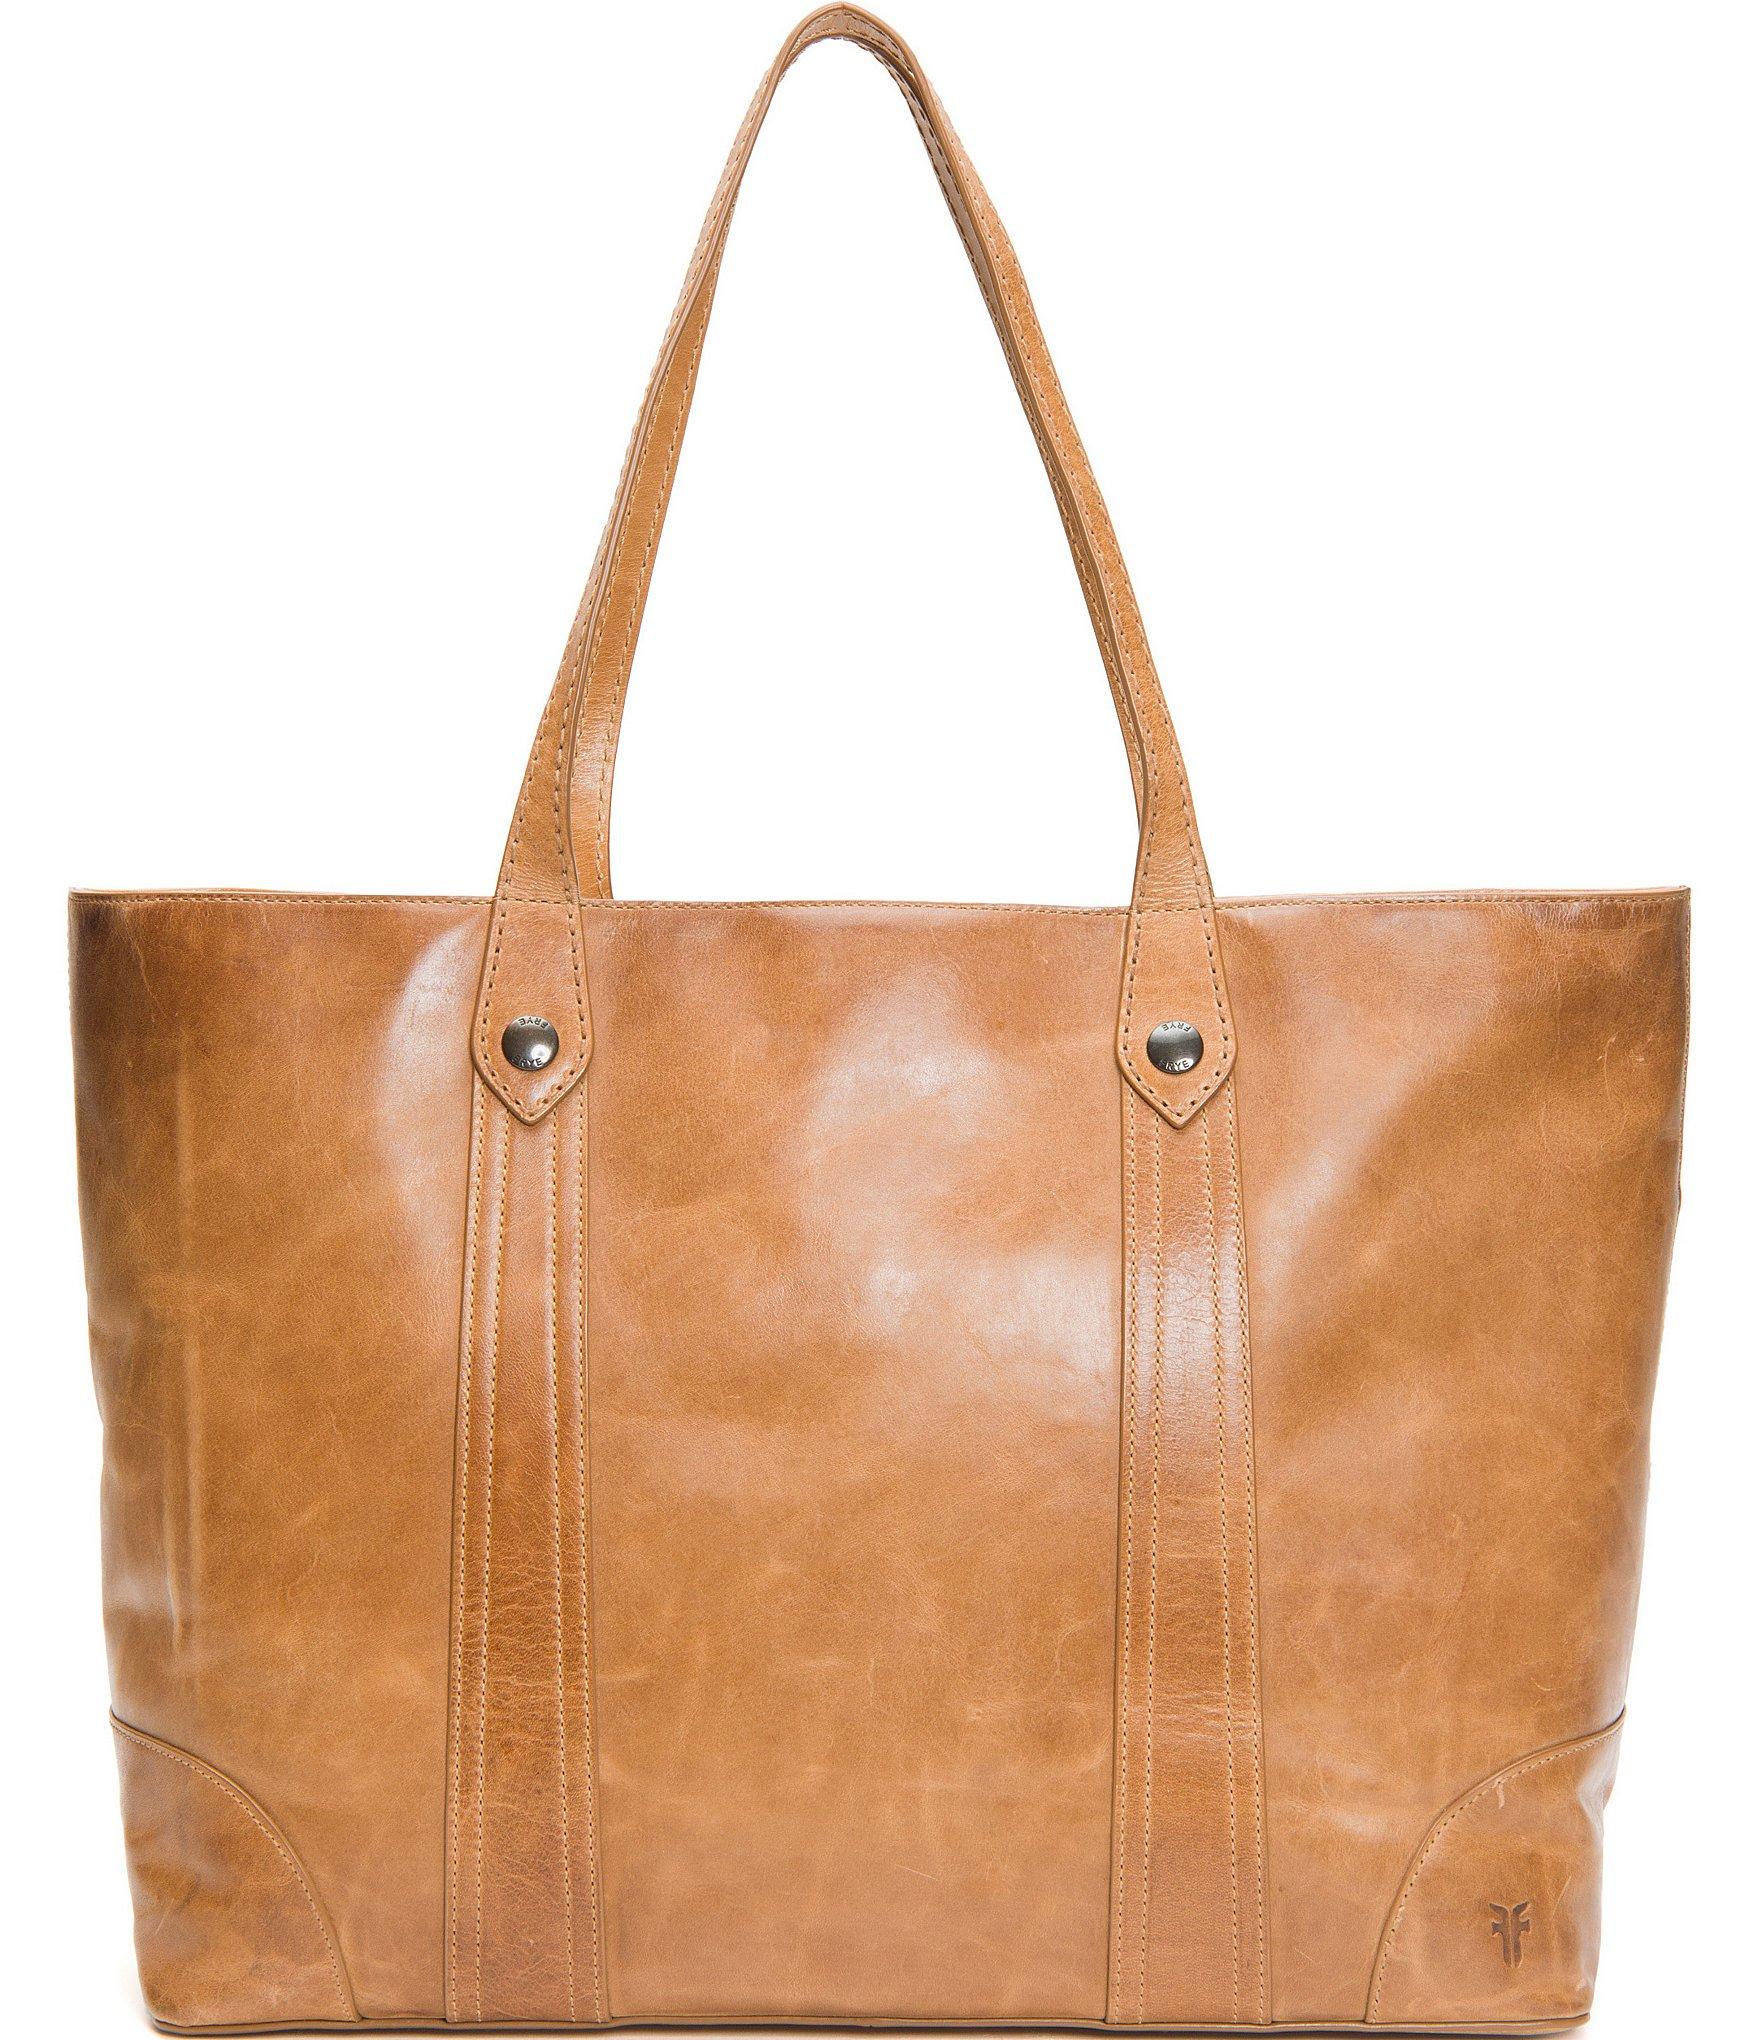 Tan A Tote Bags Dillard S